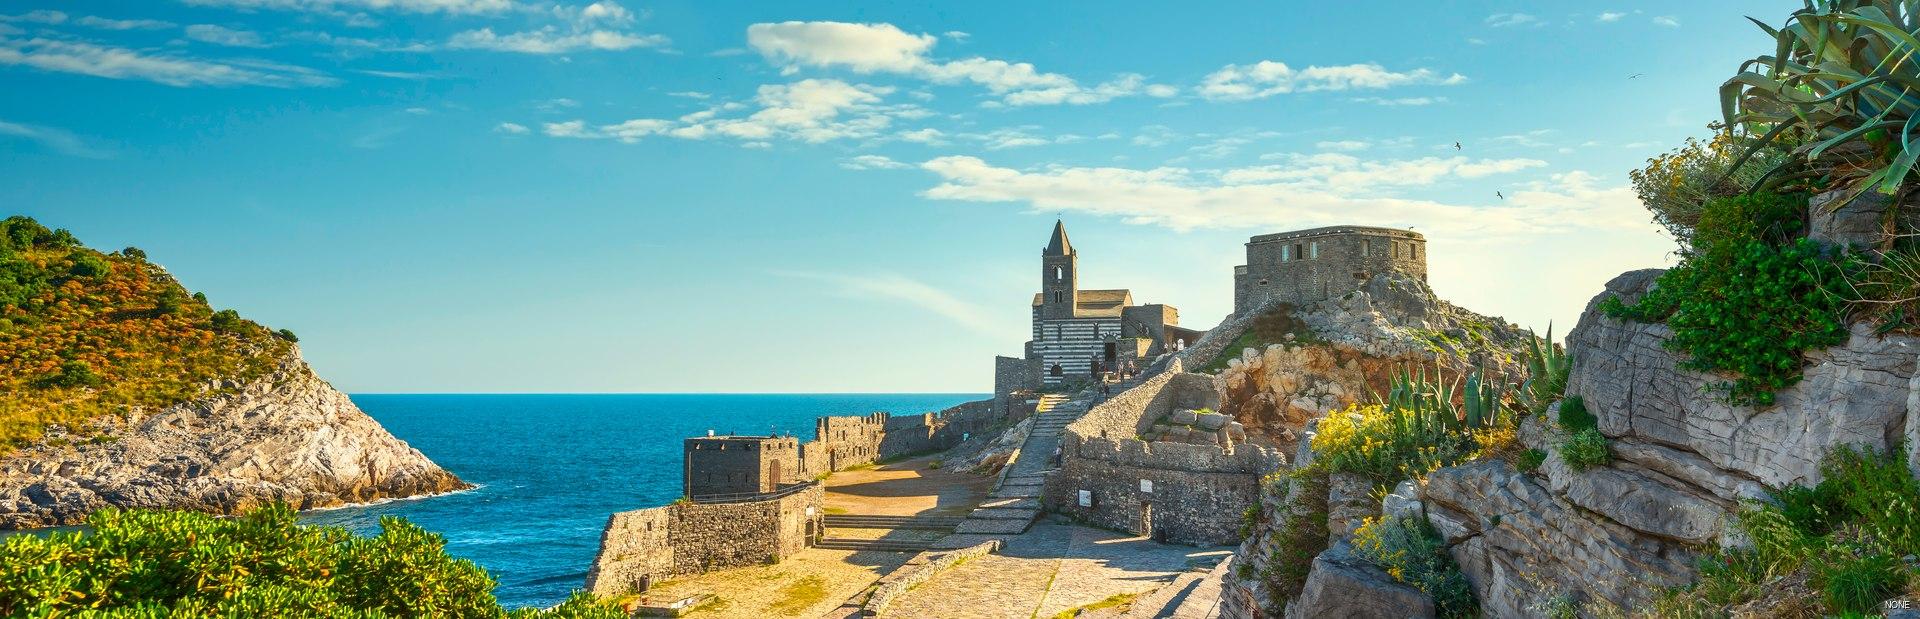 Portovenere charter itineraries